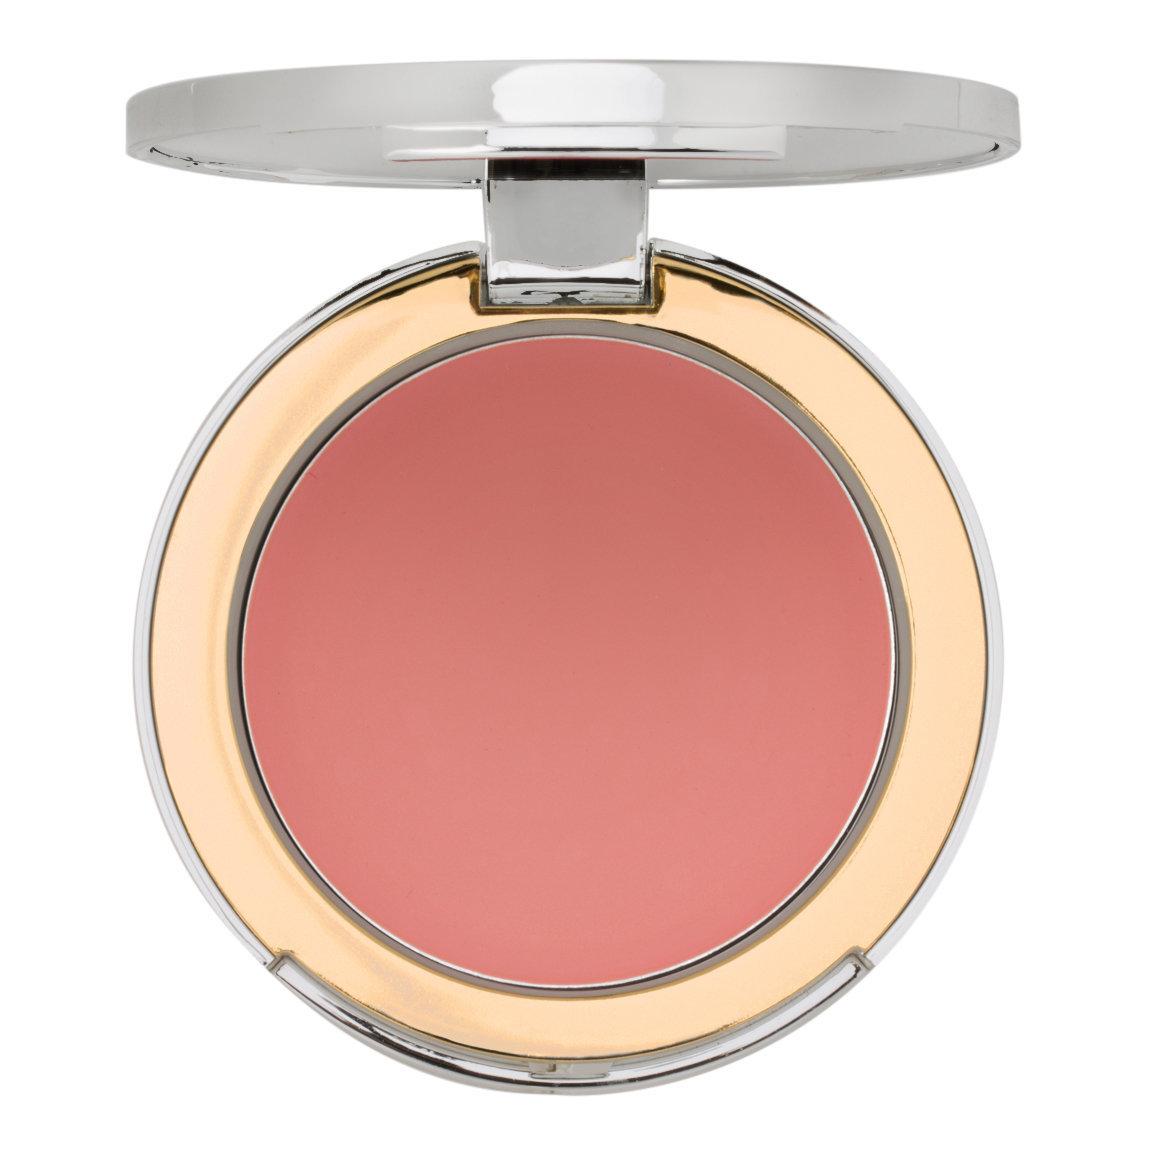 IT Cosmetics  CC+ Vitality Brightening Crème Blush Naturally Pretty alternative view 1.